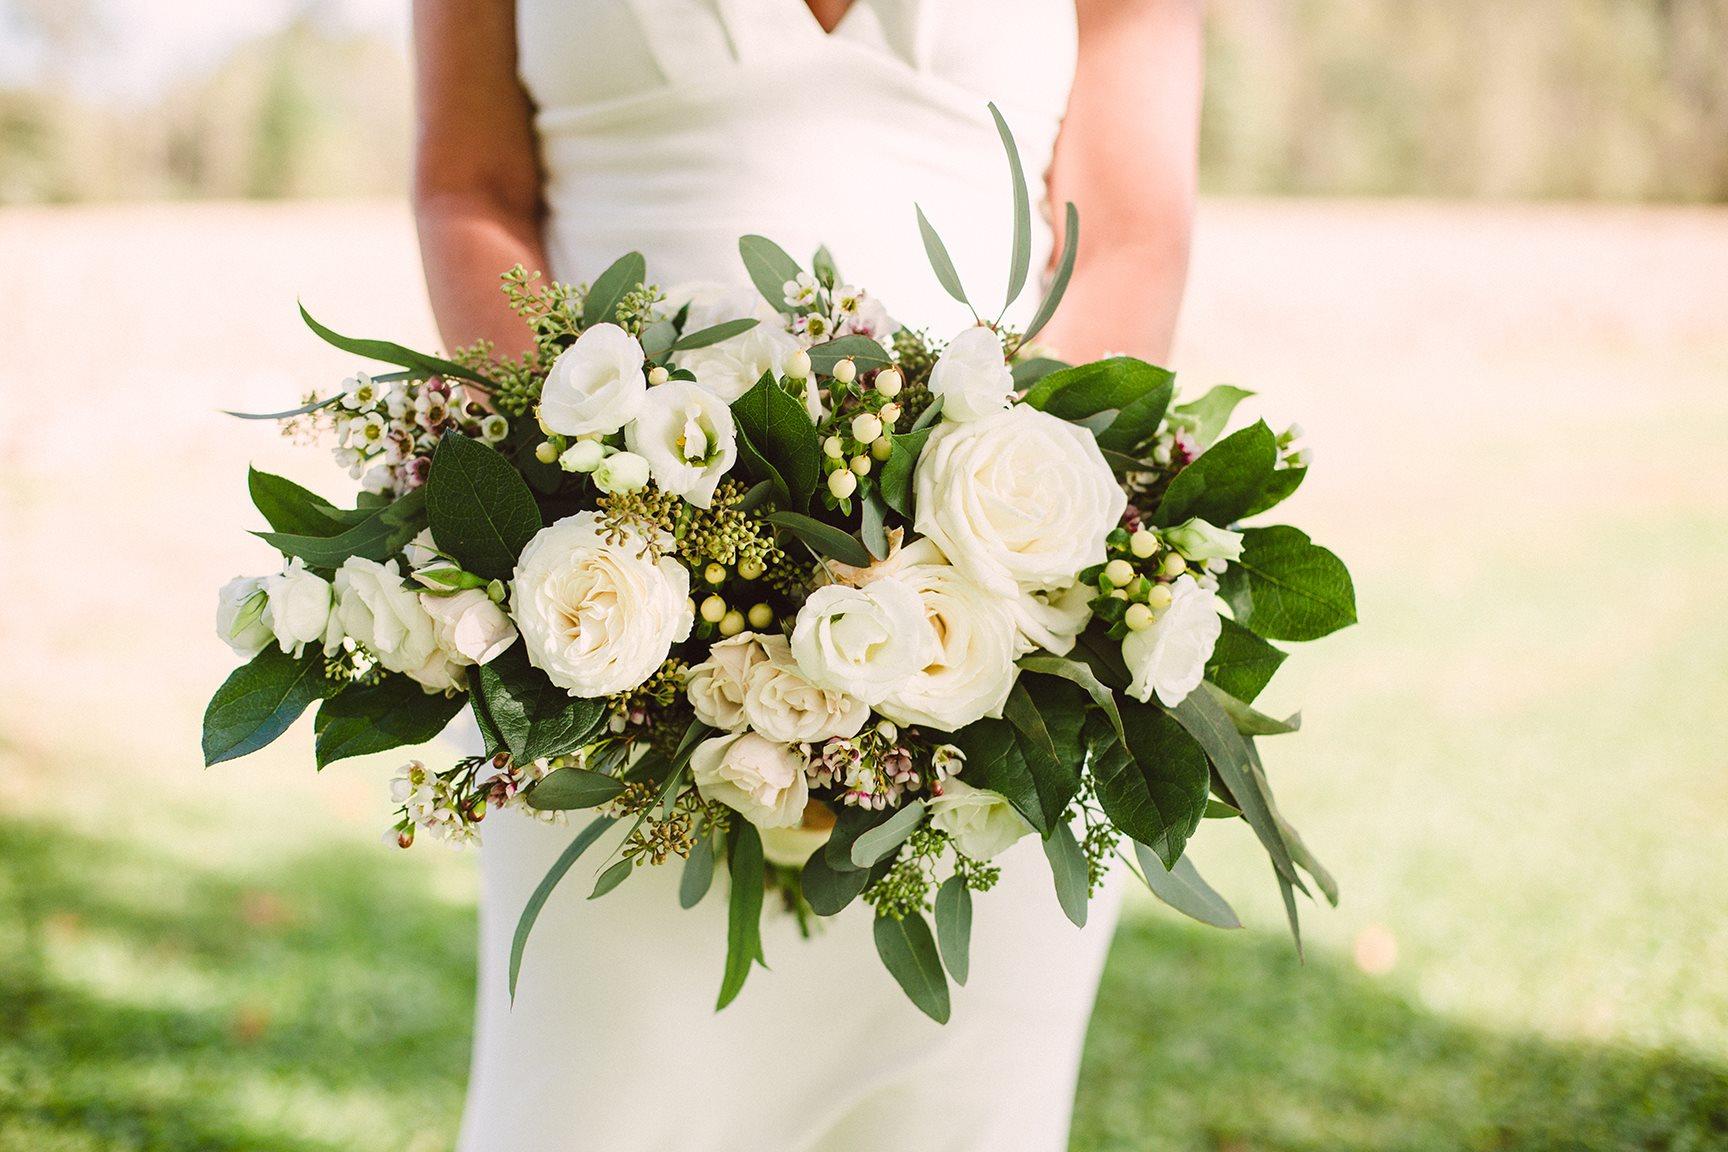 White and green bouquet - Cincinnati bride - White bridal bouquet